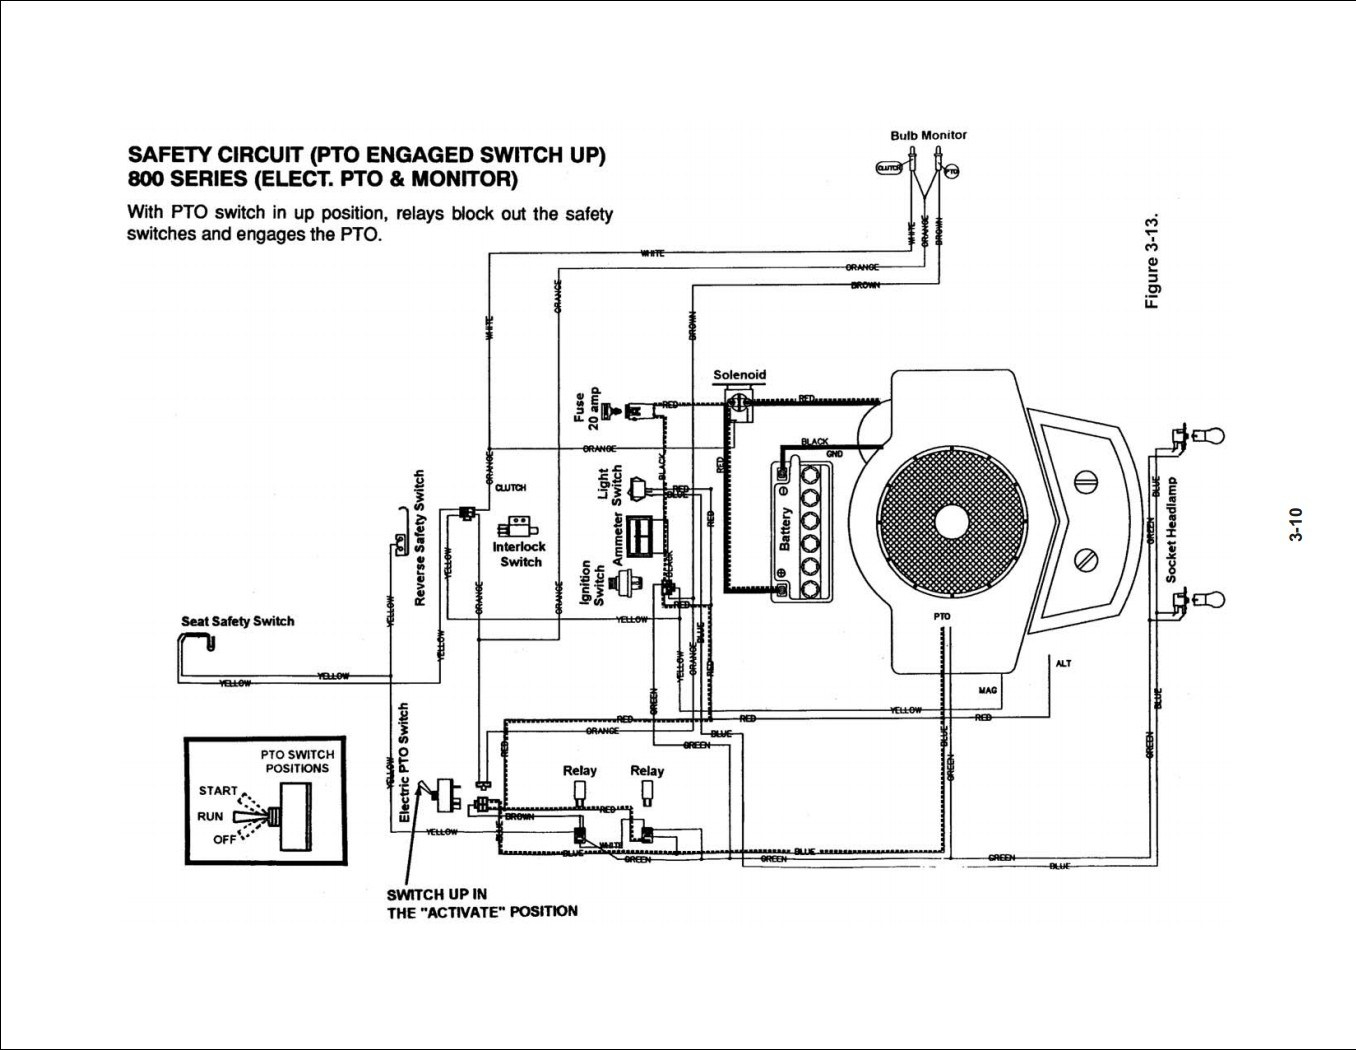 42a707 Wiring Diagram